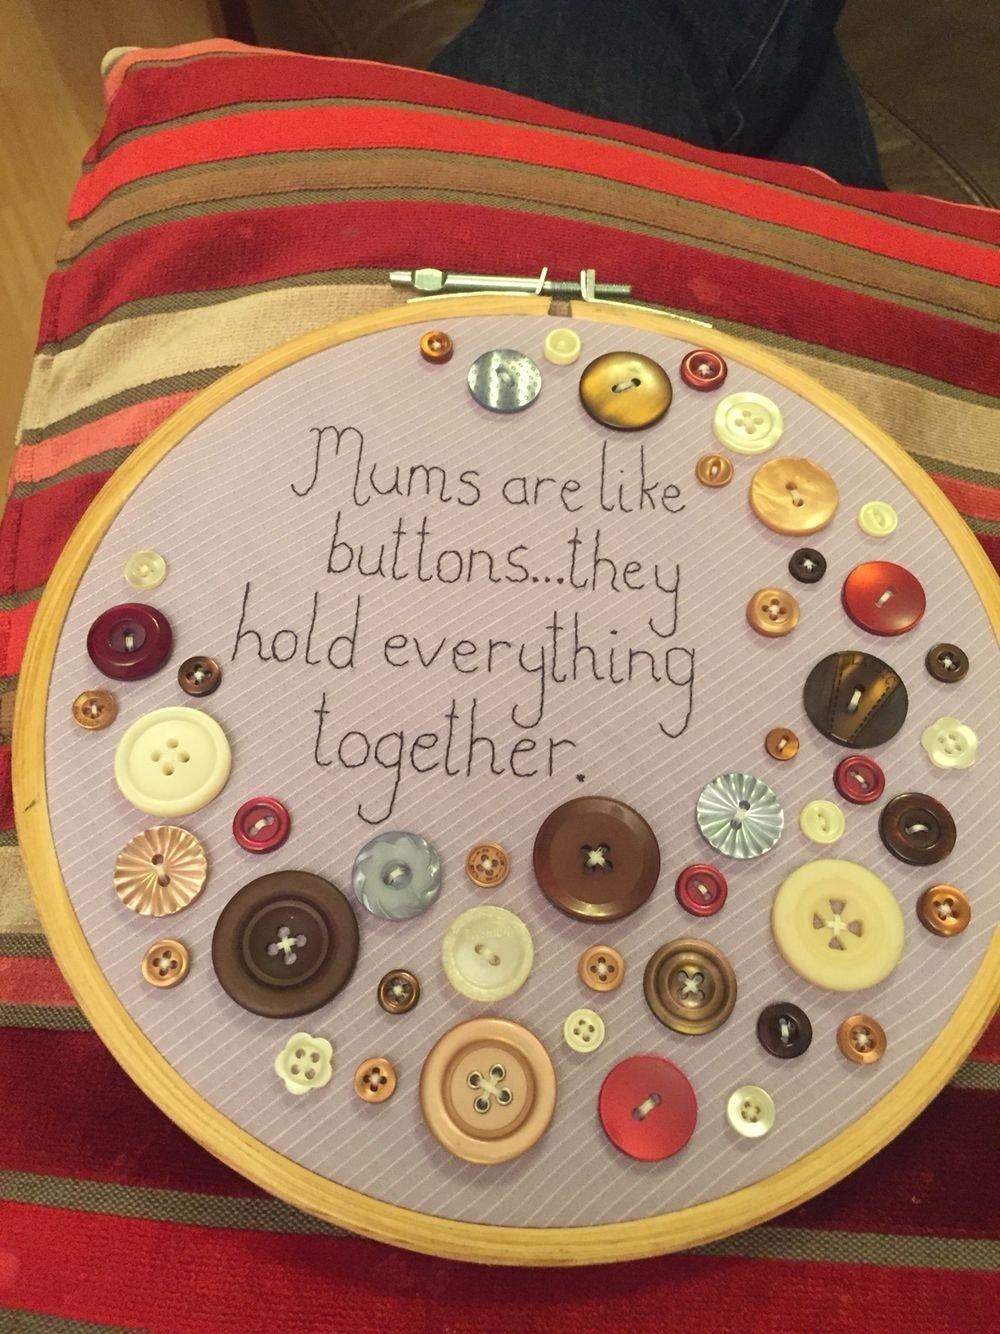 10 Wonderful Mom 60Th Birthday Gift Ideas 60th Present For Mumhope She Likes It Diy